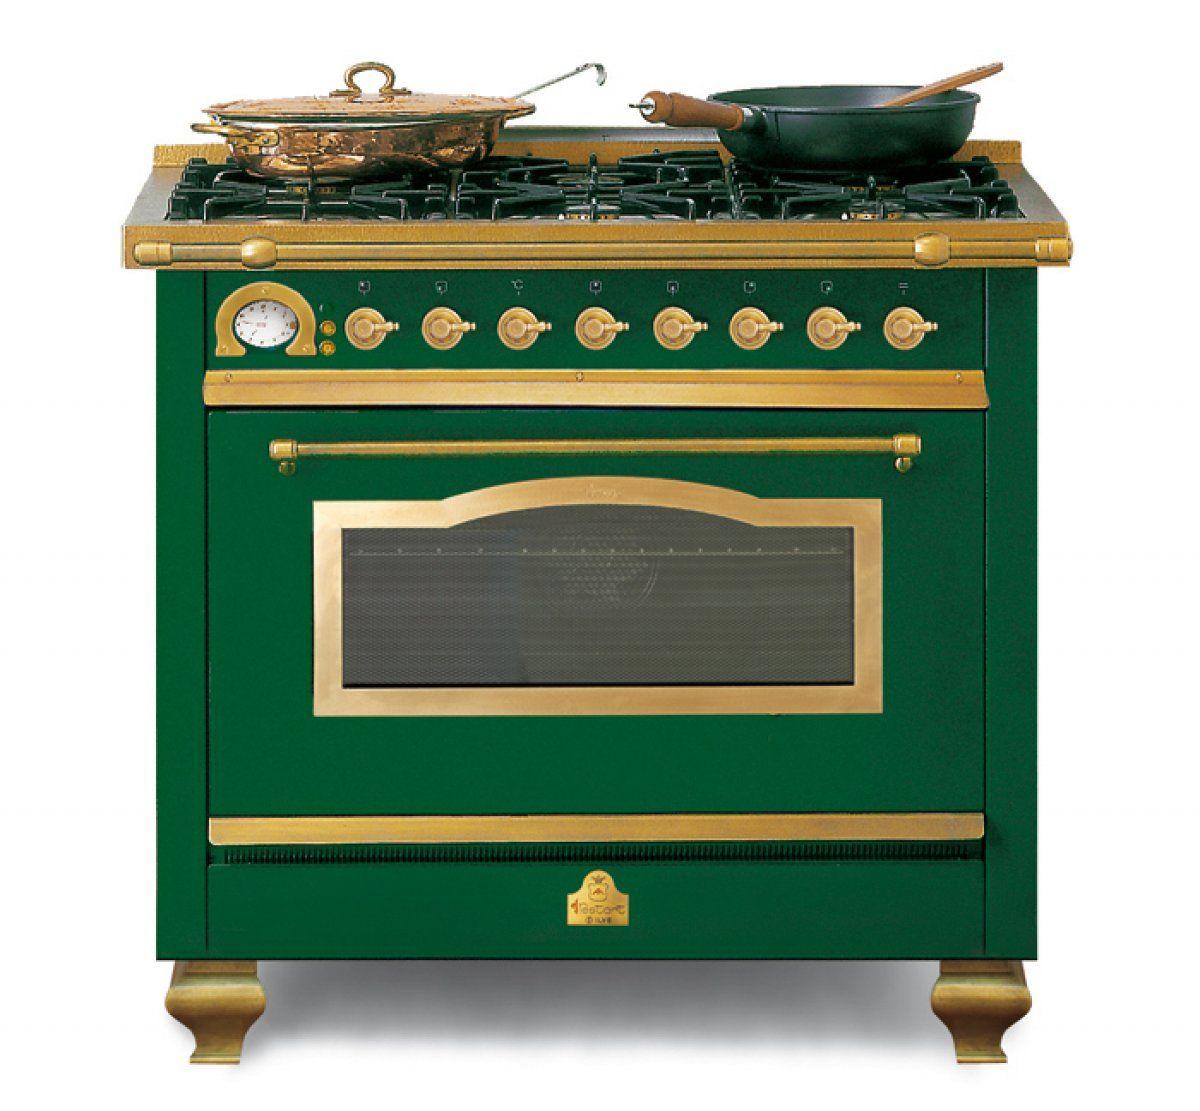 Restart Firenze Cucine- Forni Rame, Range Cooker Blocchi Cottura e ...